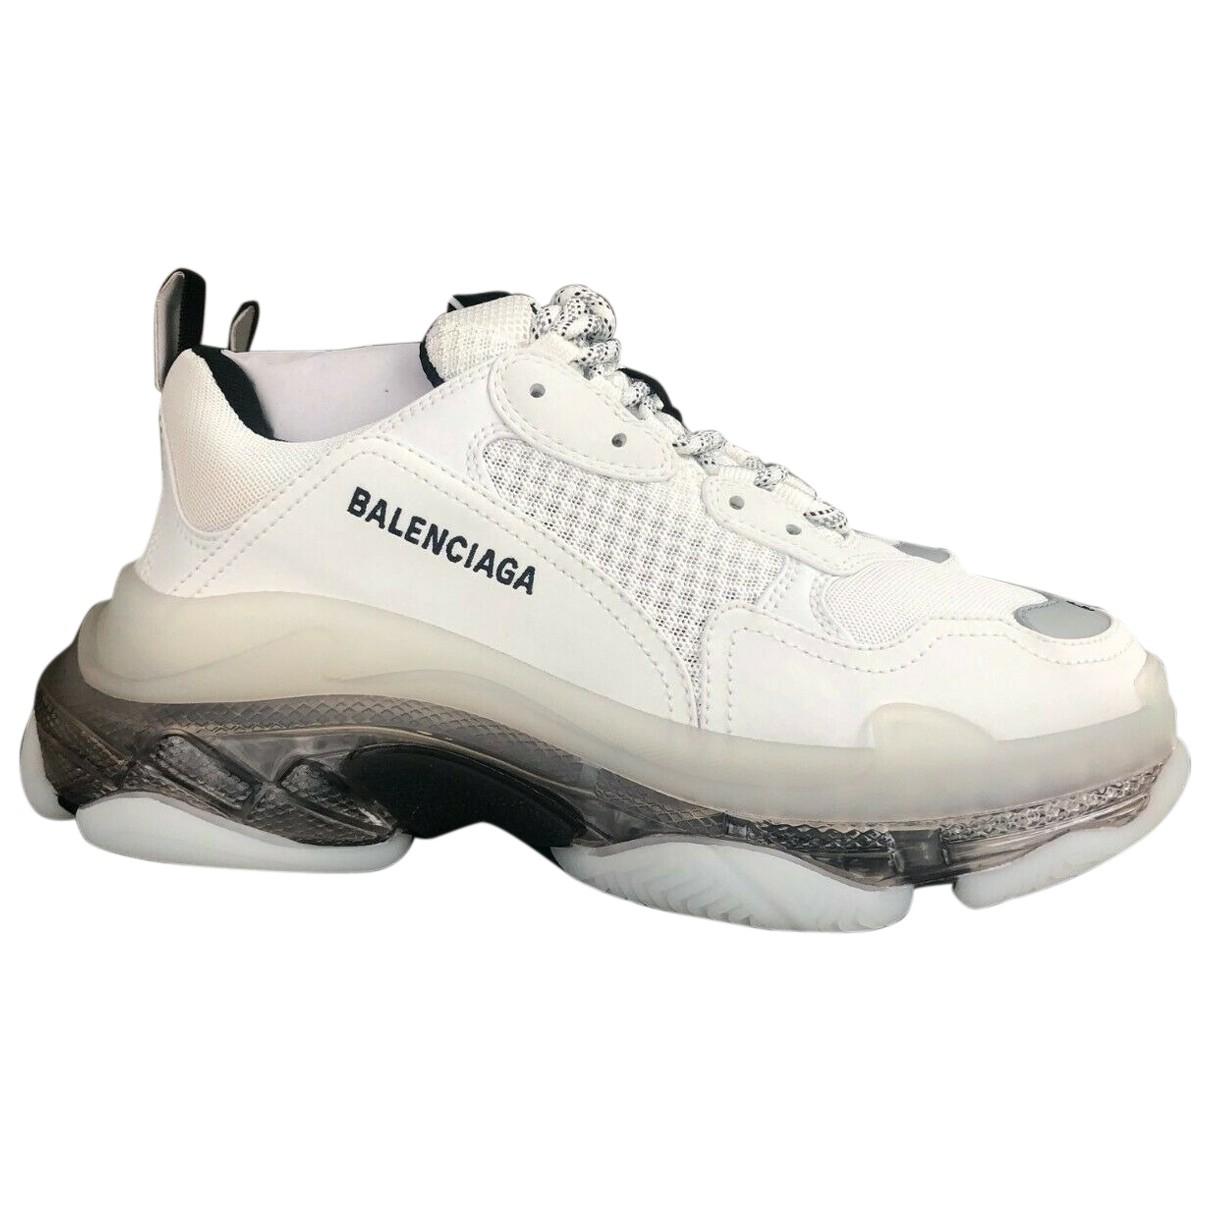 Balenciaga - Baskets Triple S pour homme en toile - blanc